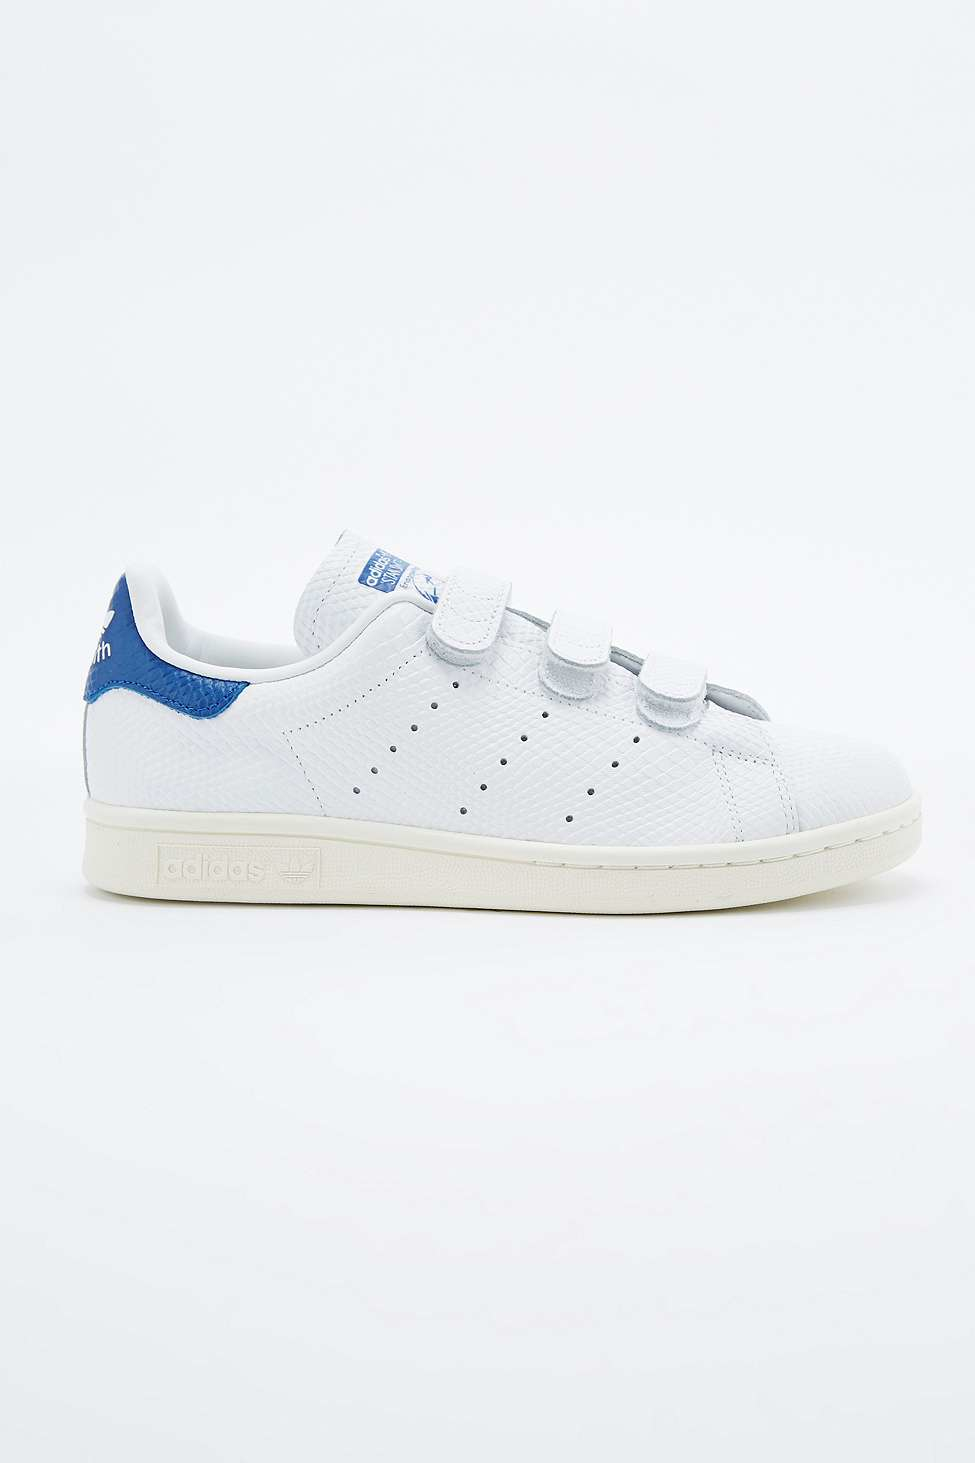 Adidas Stan Smith Blue Velcro